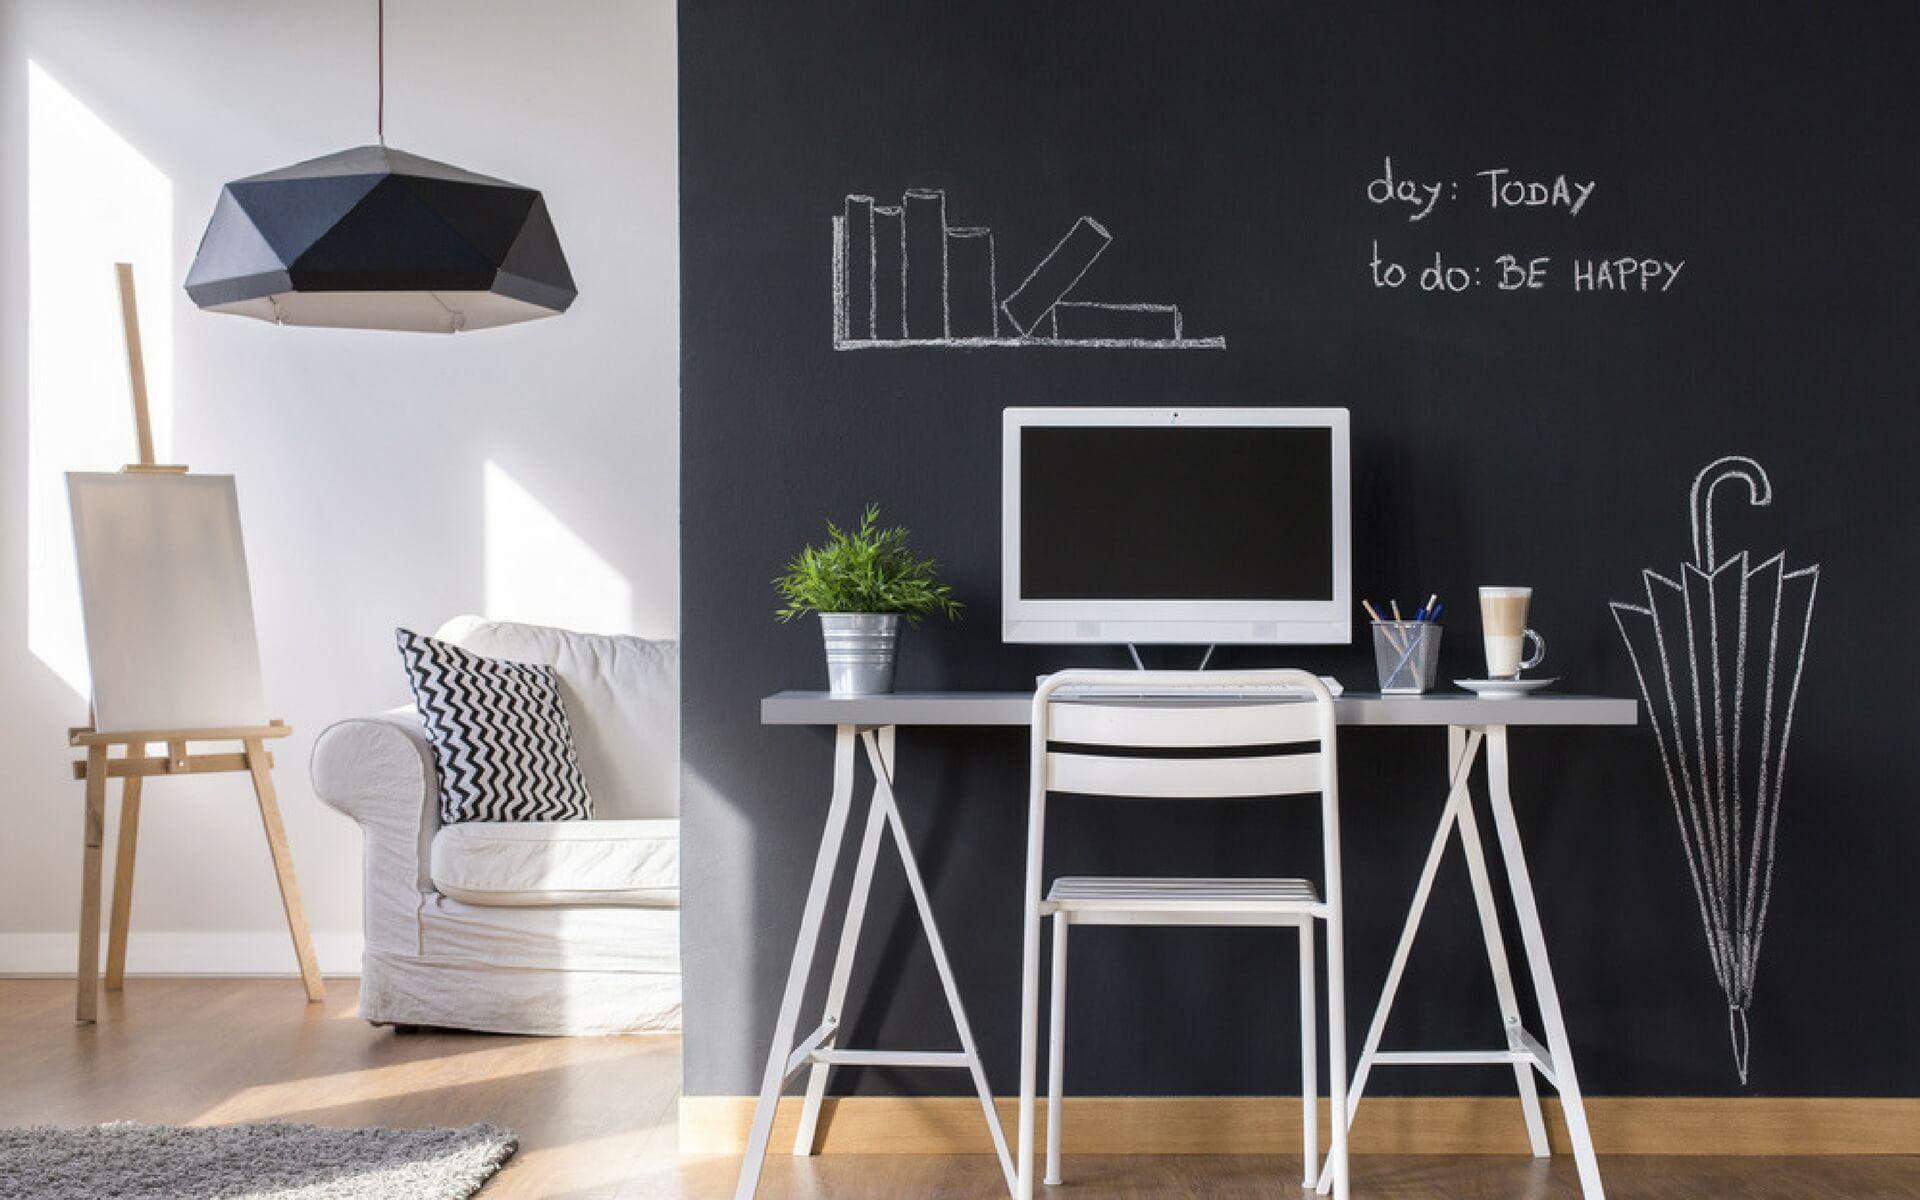 Decorare le pareti con vernice lavagna blog oknoplast - Lavagna magnetica da cucina ...